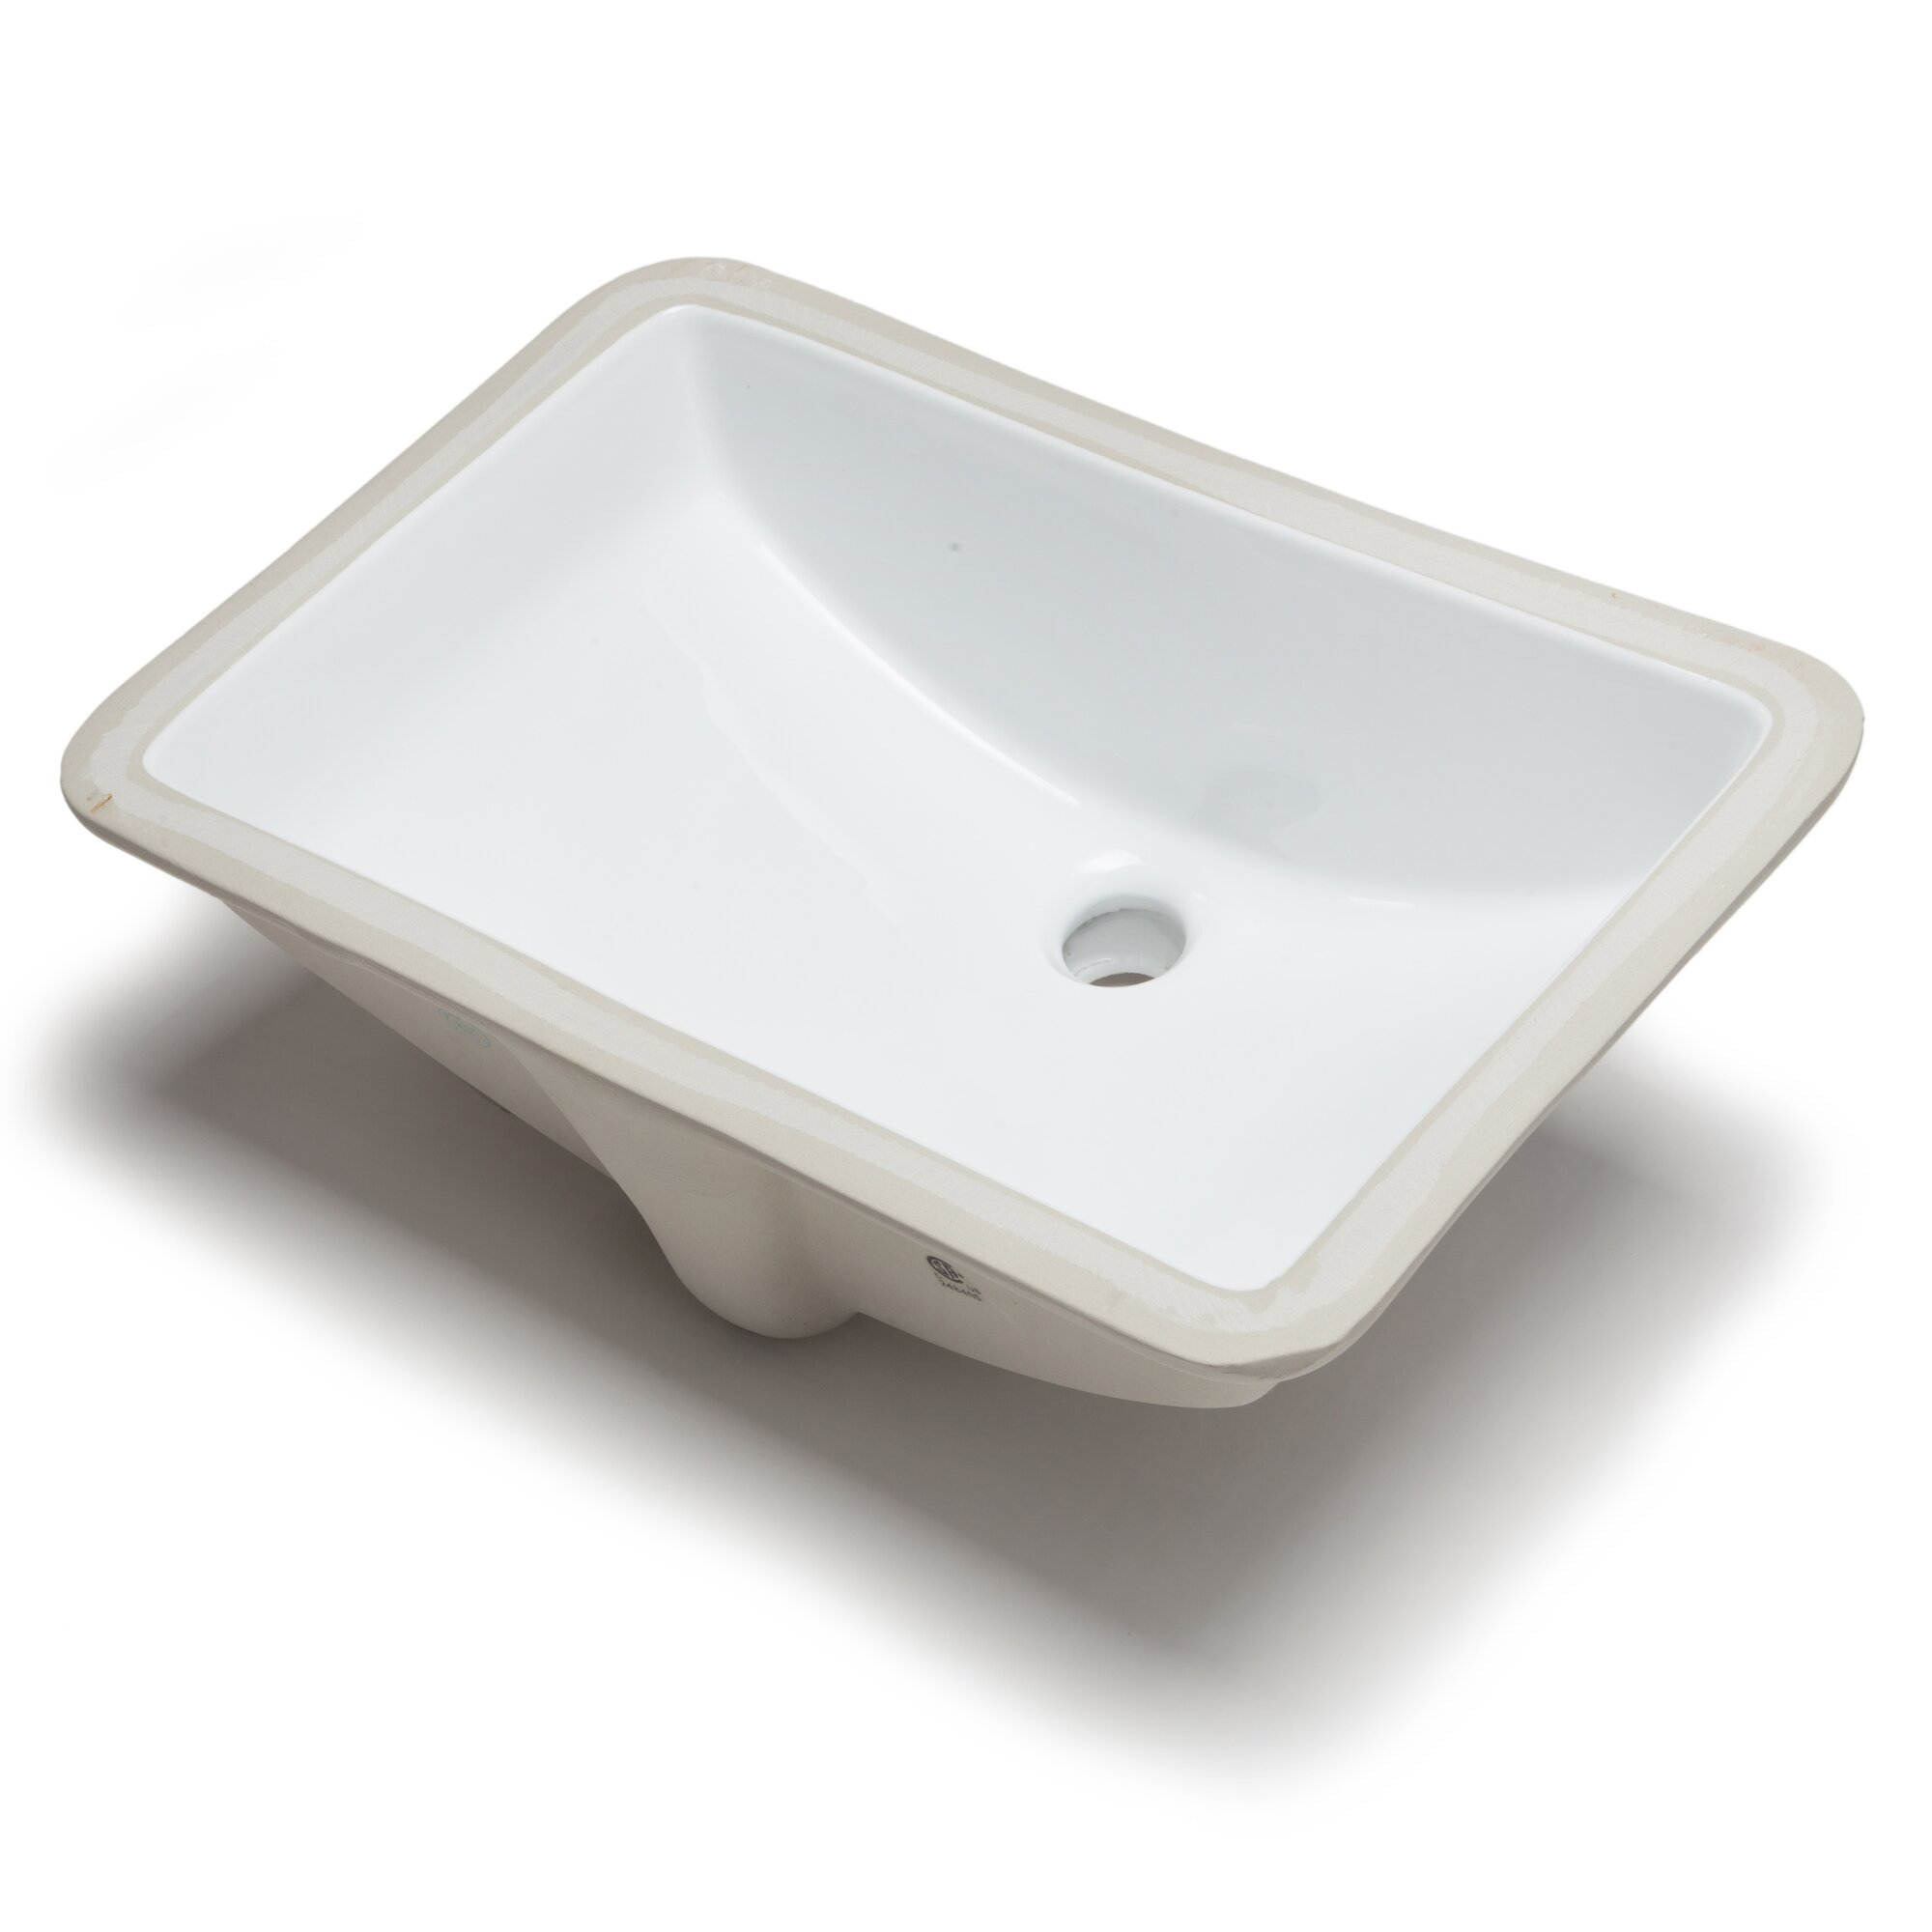 Hahn Ceramic Bowl Rectangular Undermount Bathroom Sink